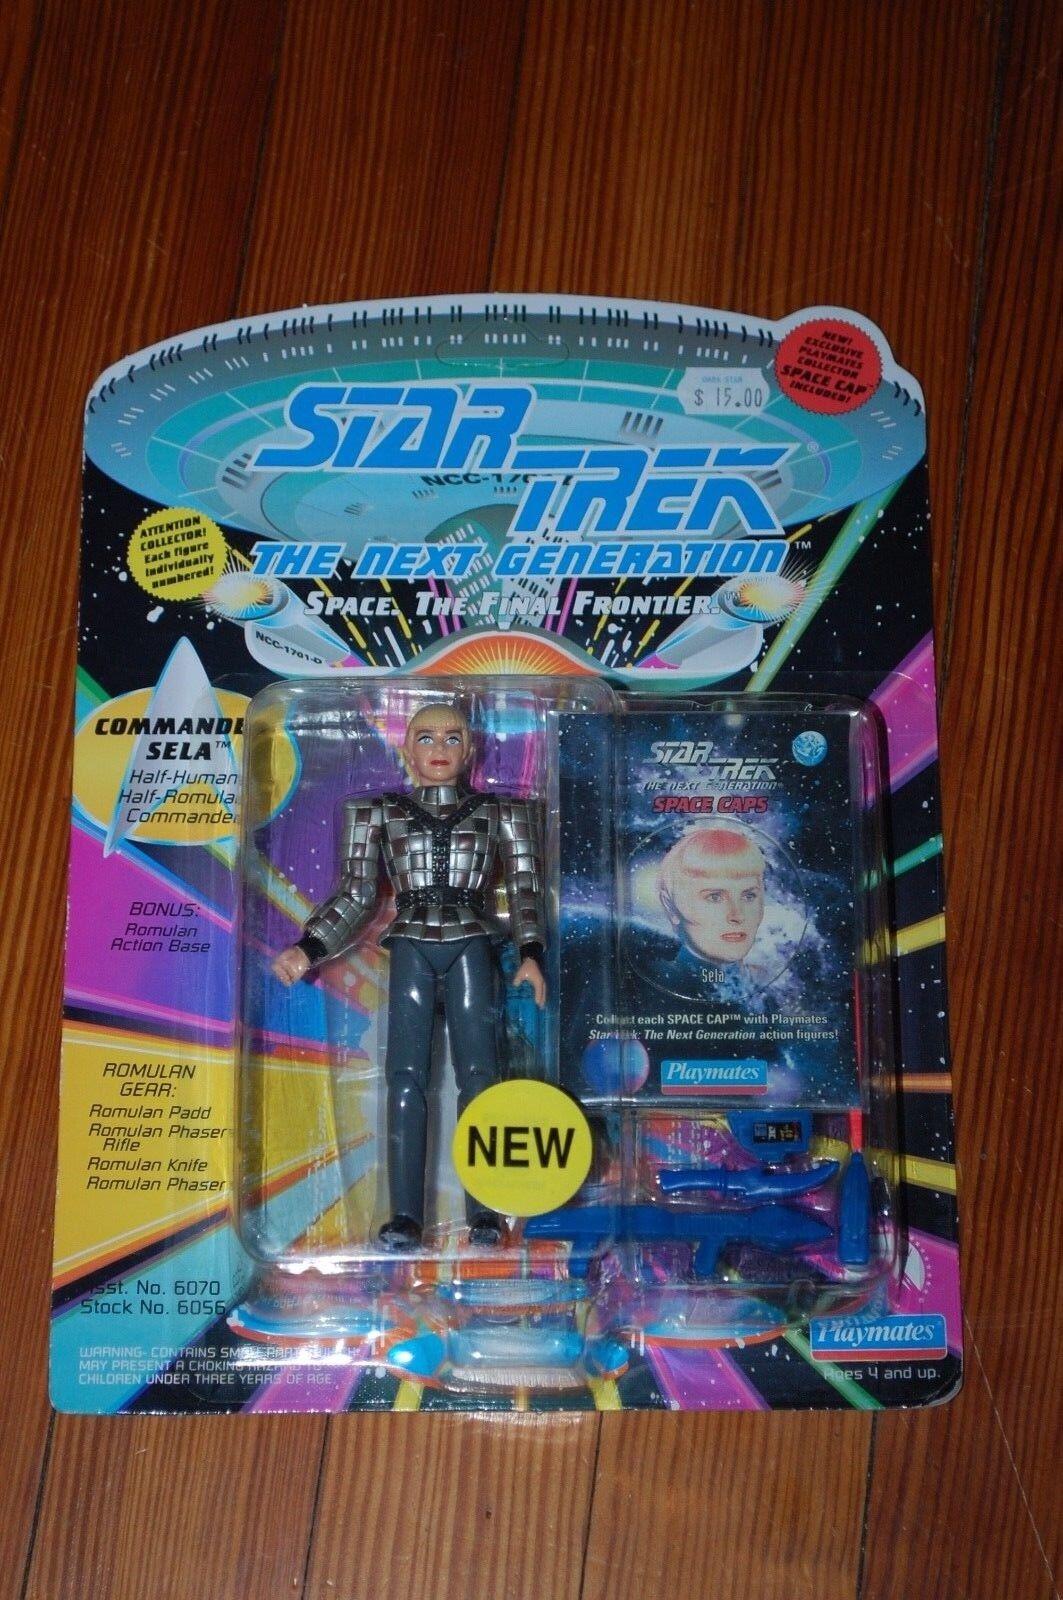 Commander Sela-Star Trek The 000287 Next Generation-MOC-Space Cap Niedrig Number 000287 The ae3774